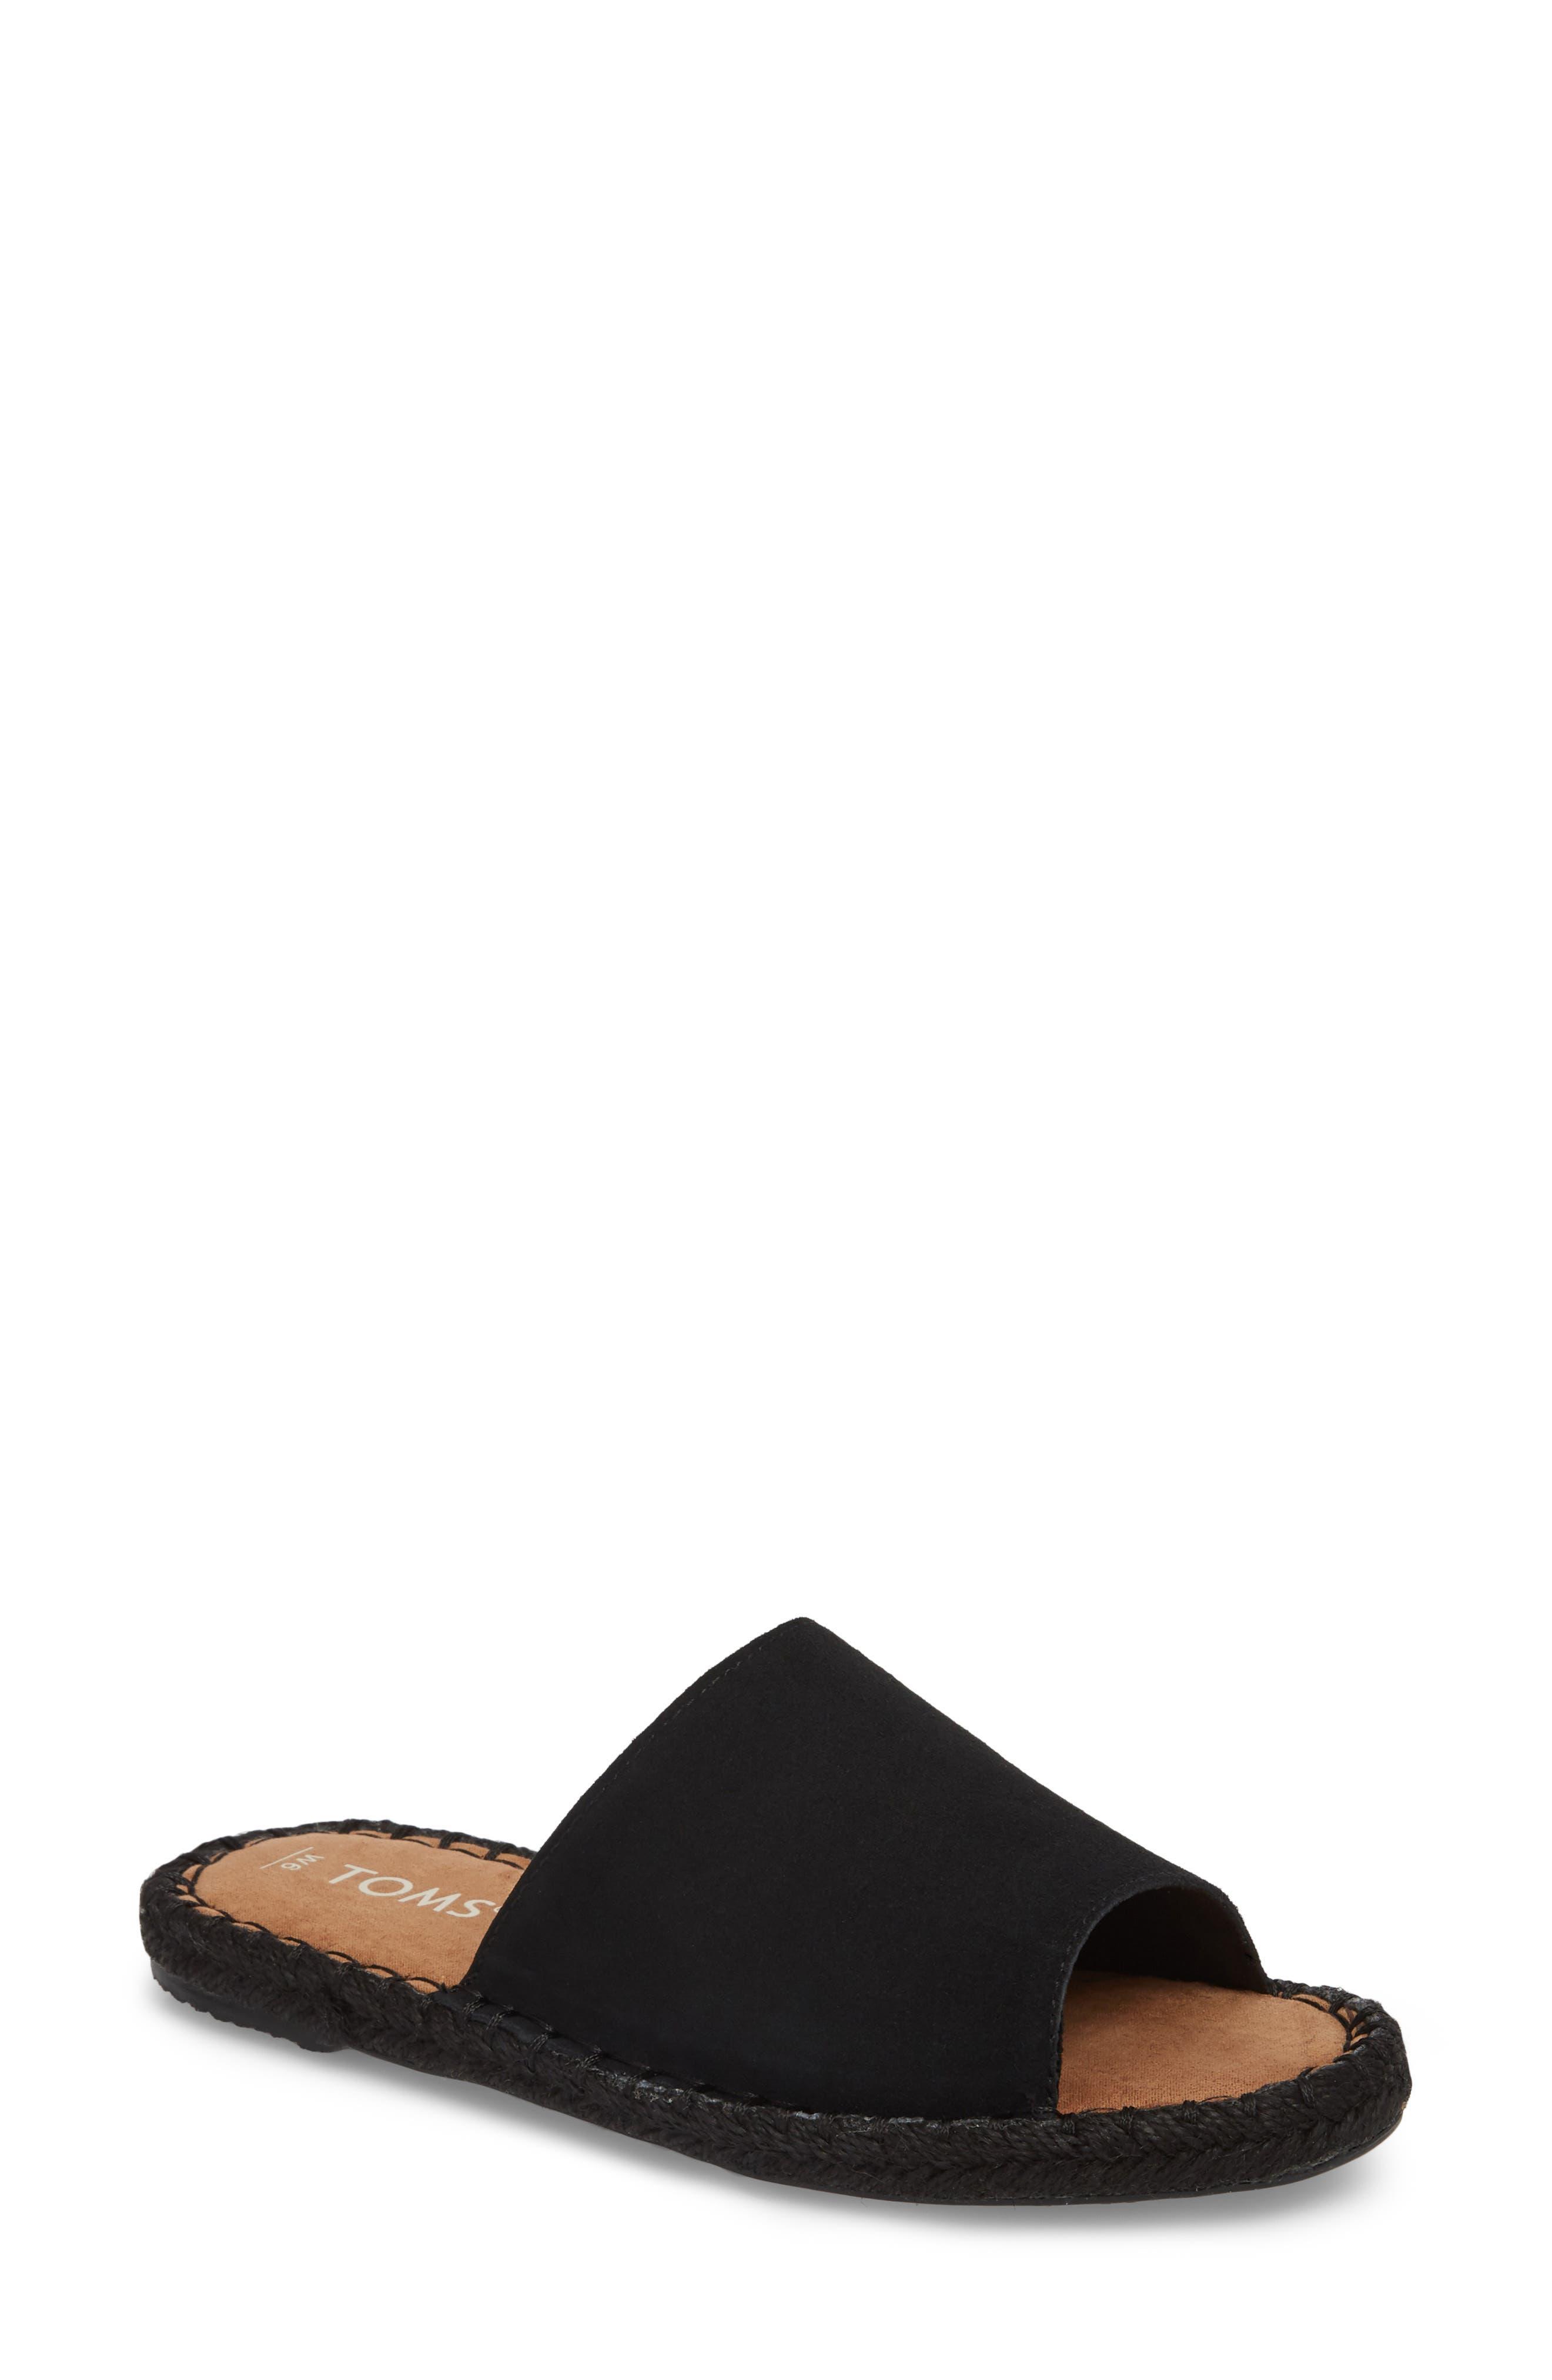 Clarita Espadrille Slide Sandal,                         Main,                         color, 001